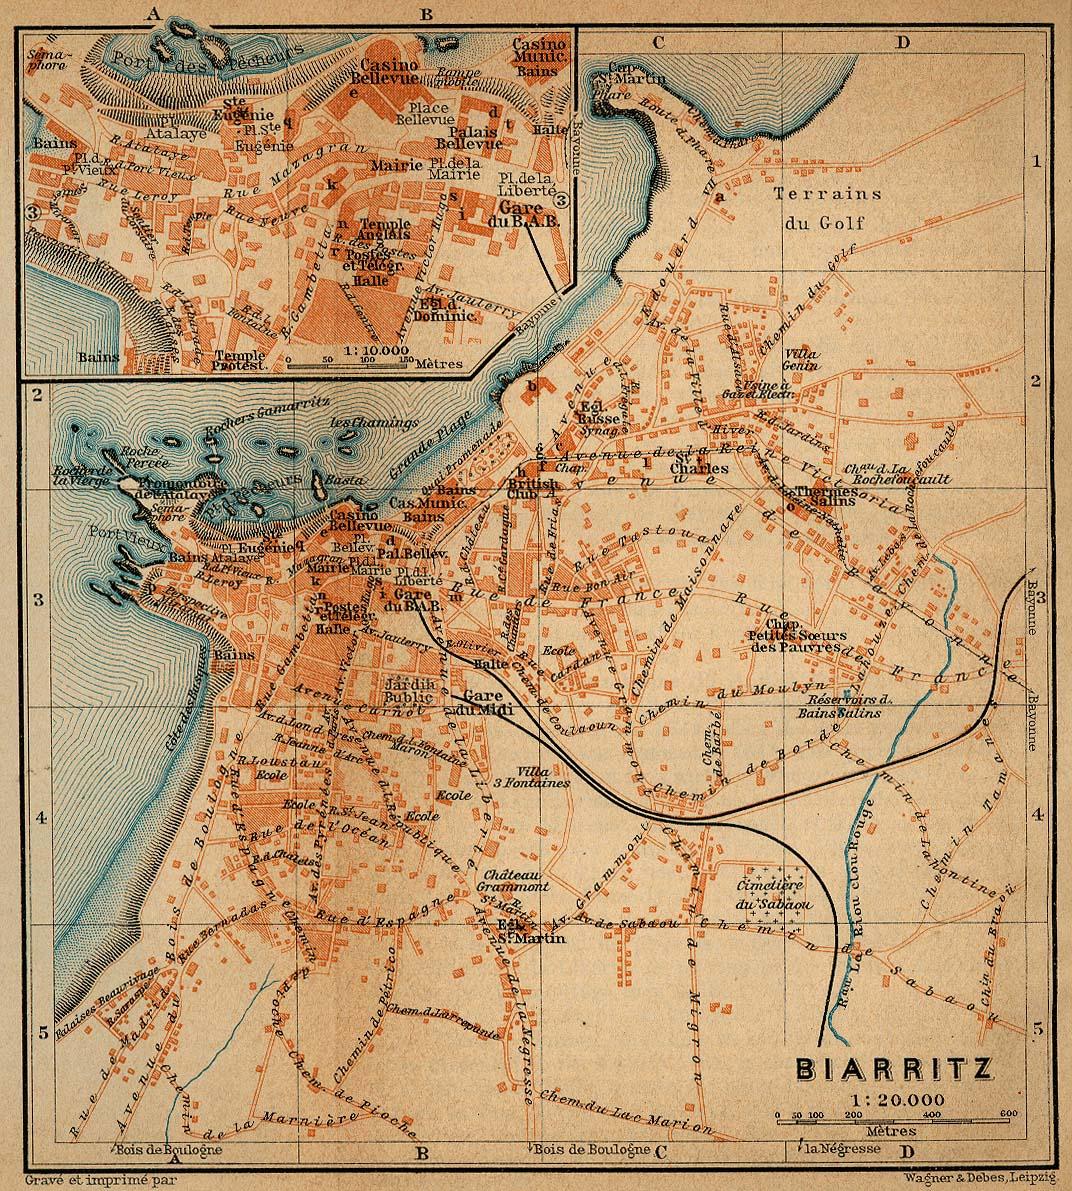 Mapa de Biarriz, Francia 1914